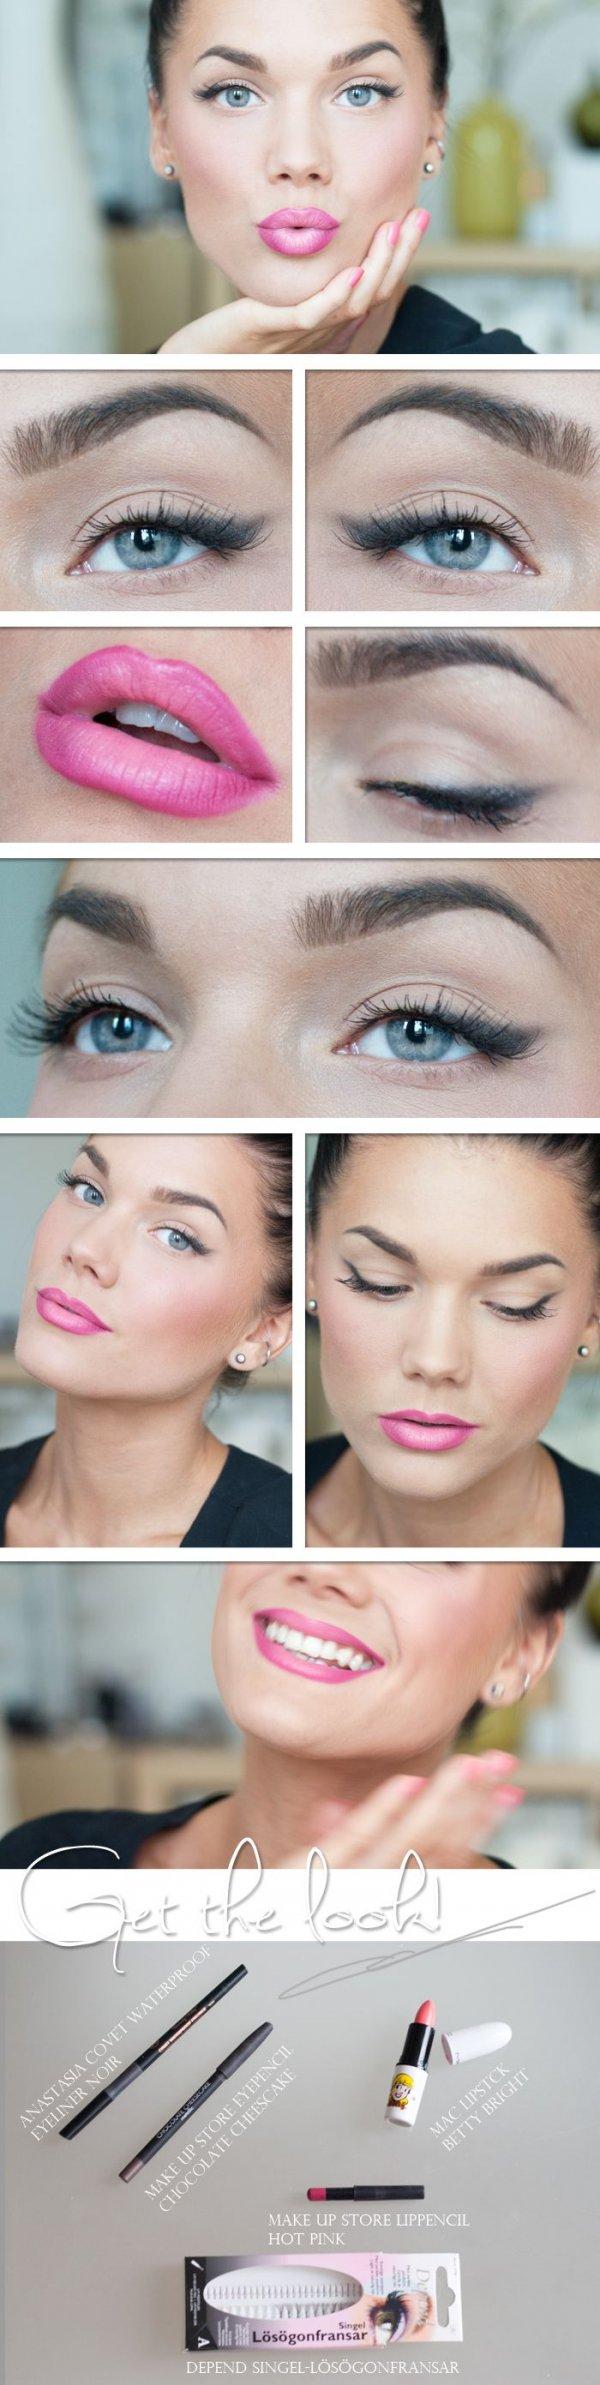 color,face,pink,beauty,lip,